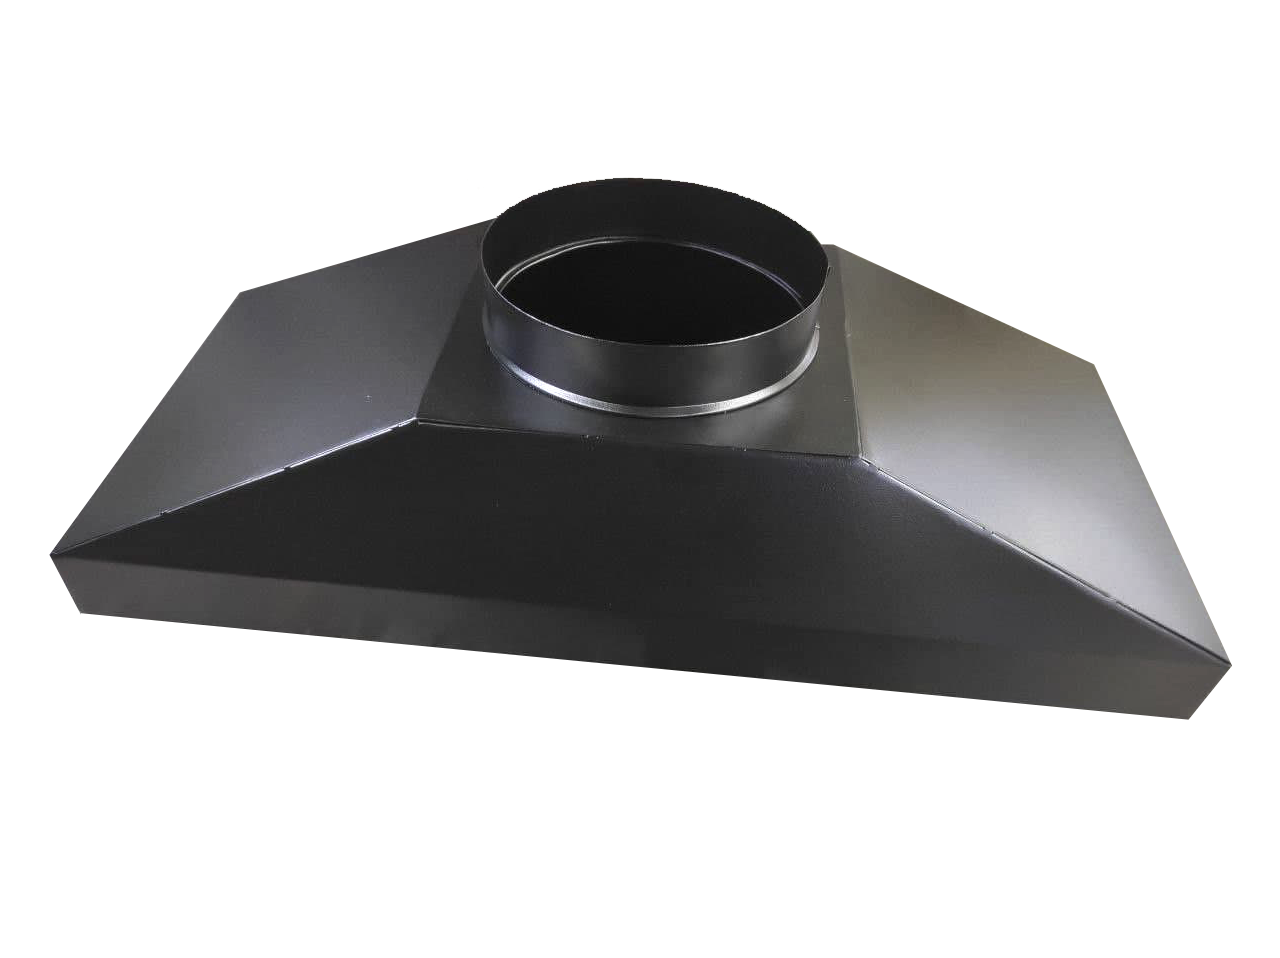 Зонт вытяжной для Cryptone-21/12 (12-15 GPU) 1010х305мм